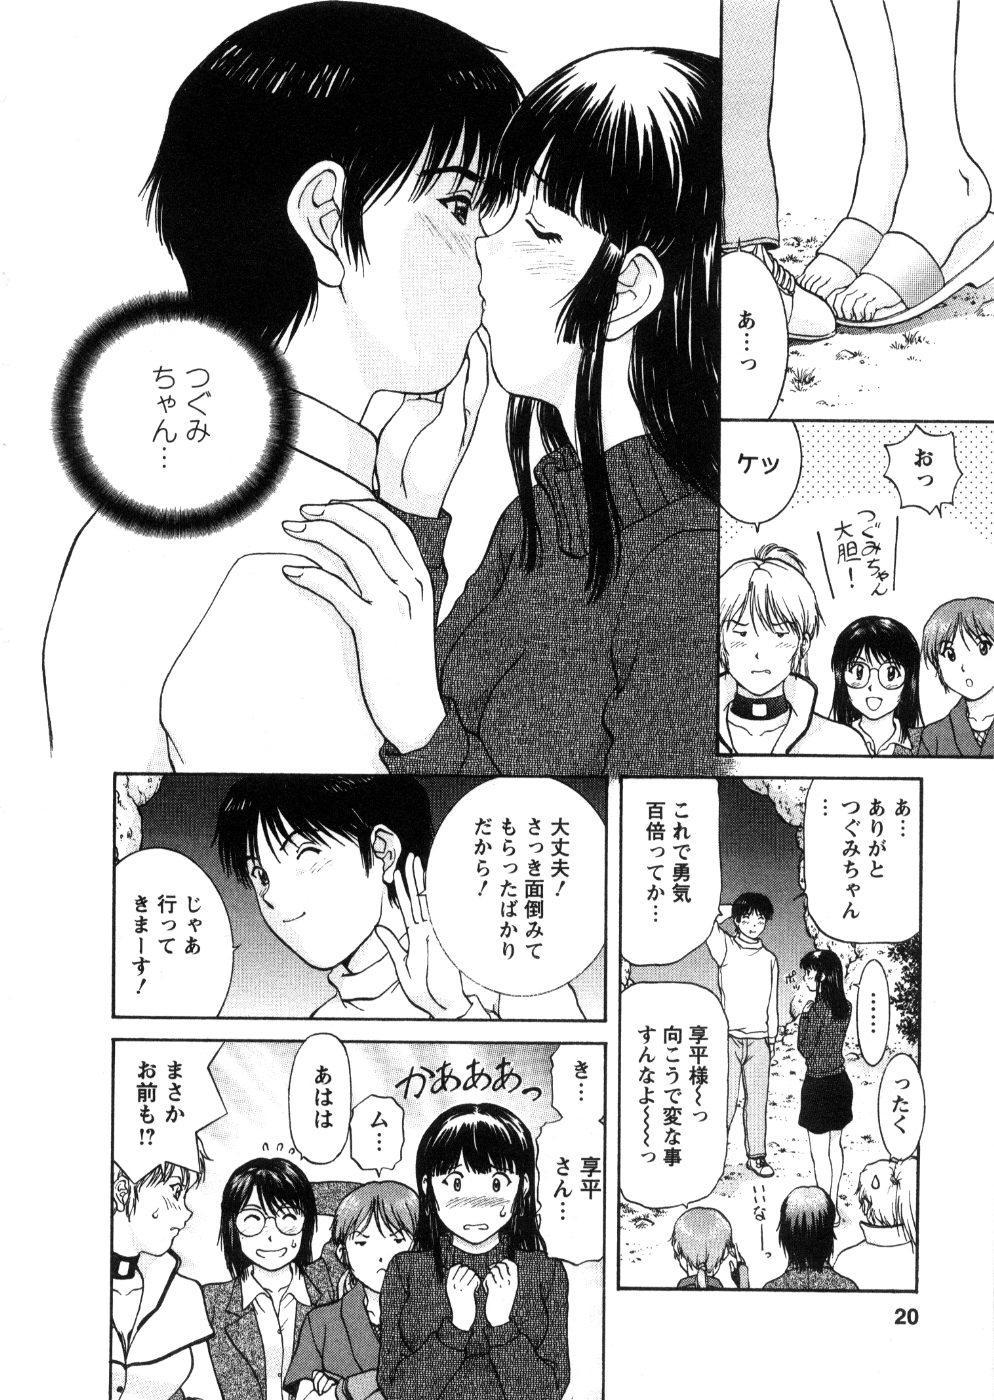 Oneechan-tachi ga Yatte Kuru 03 21